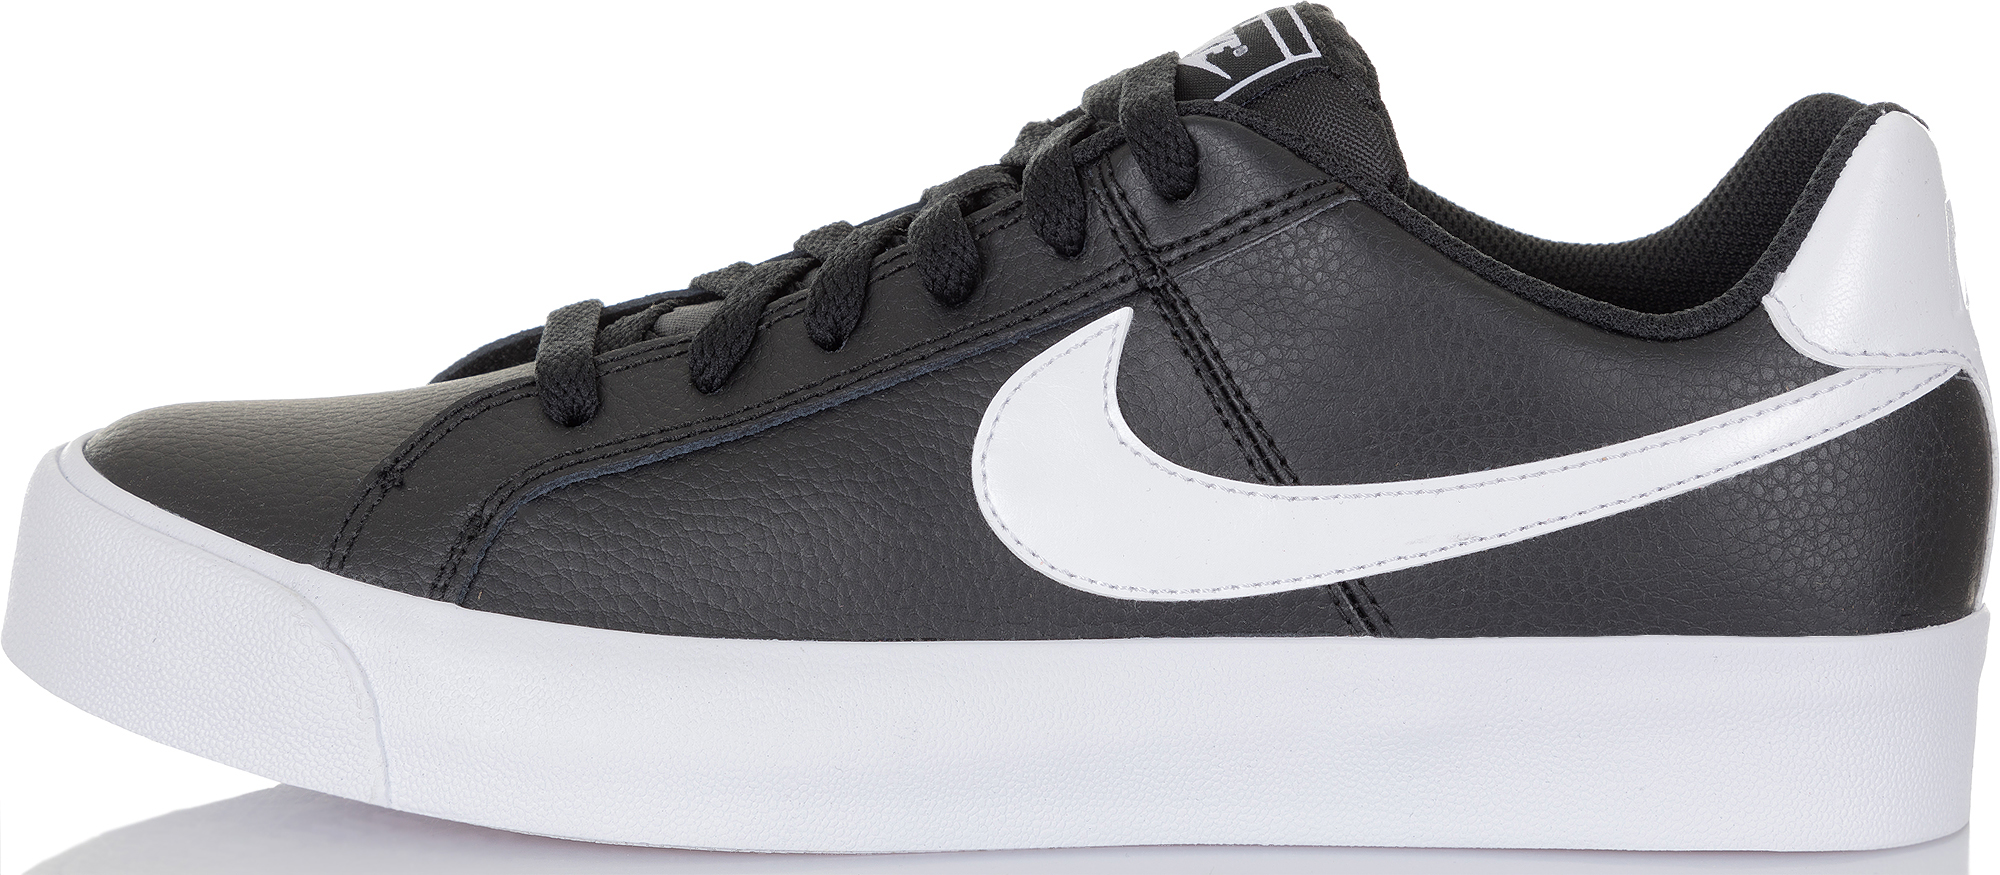 Nike Кеды женские Nike Court Royale AC, размер 35,5